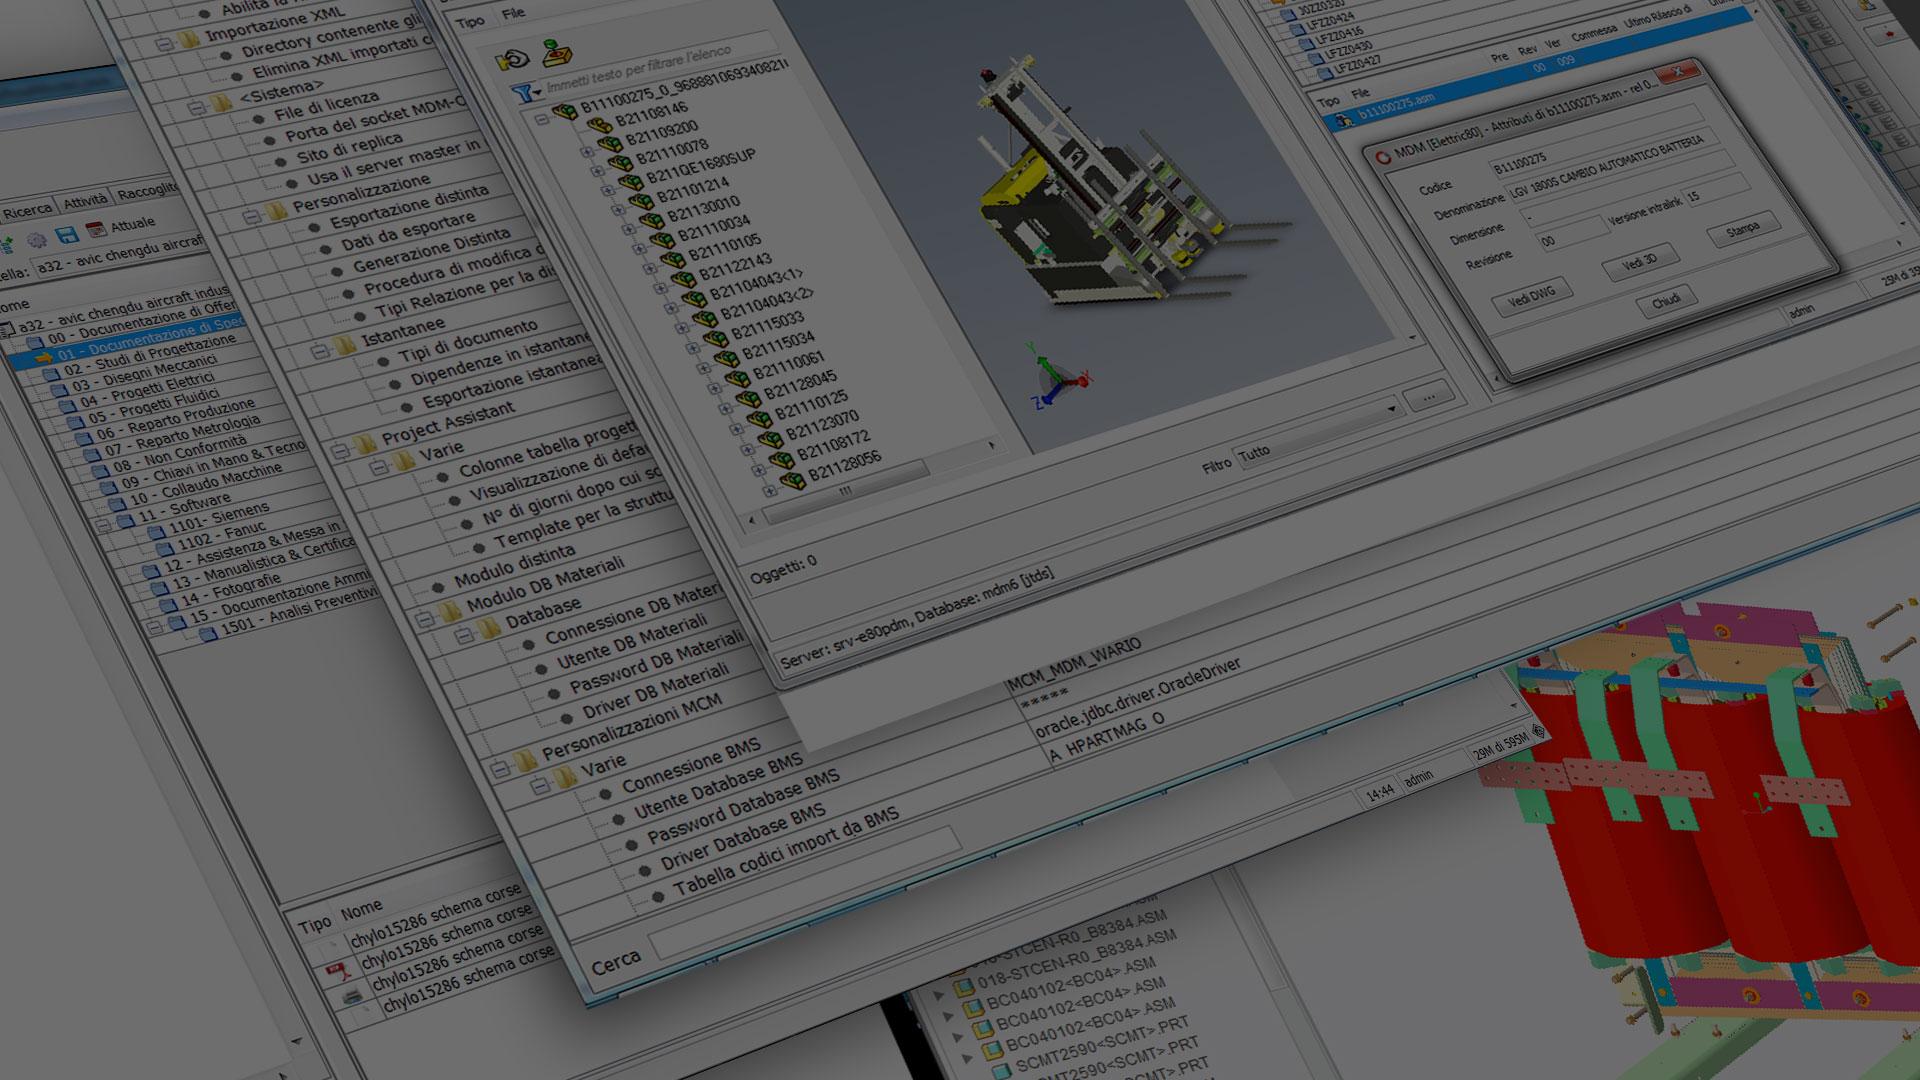 MDM - Micro Data Management